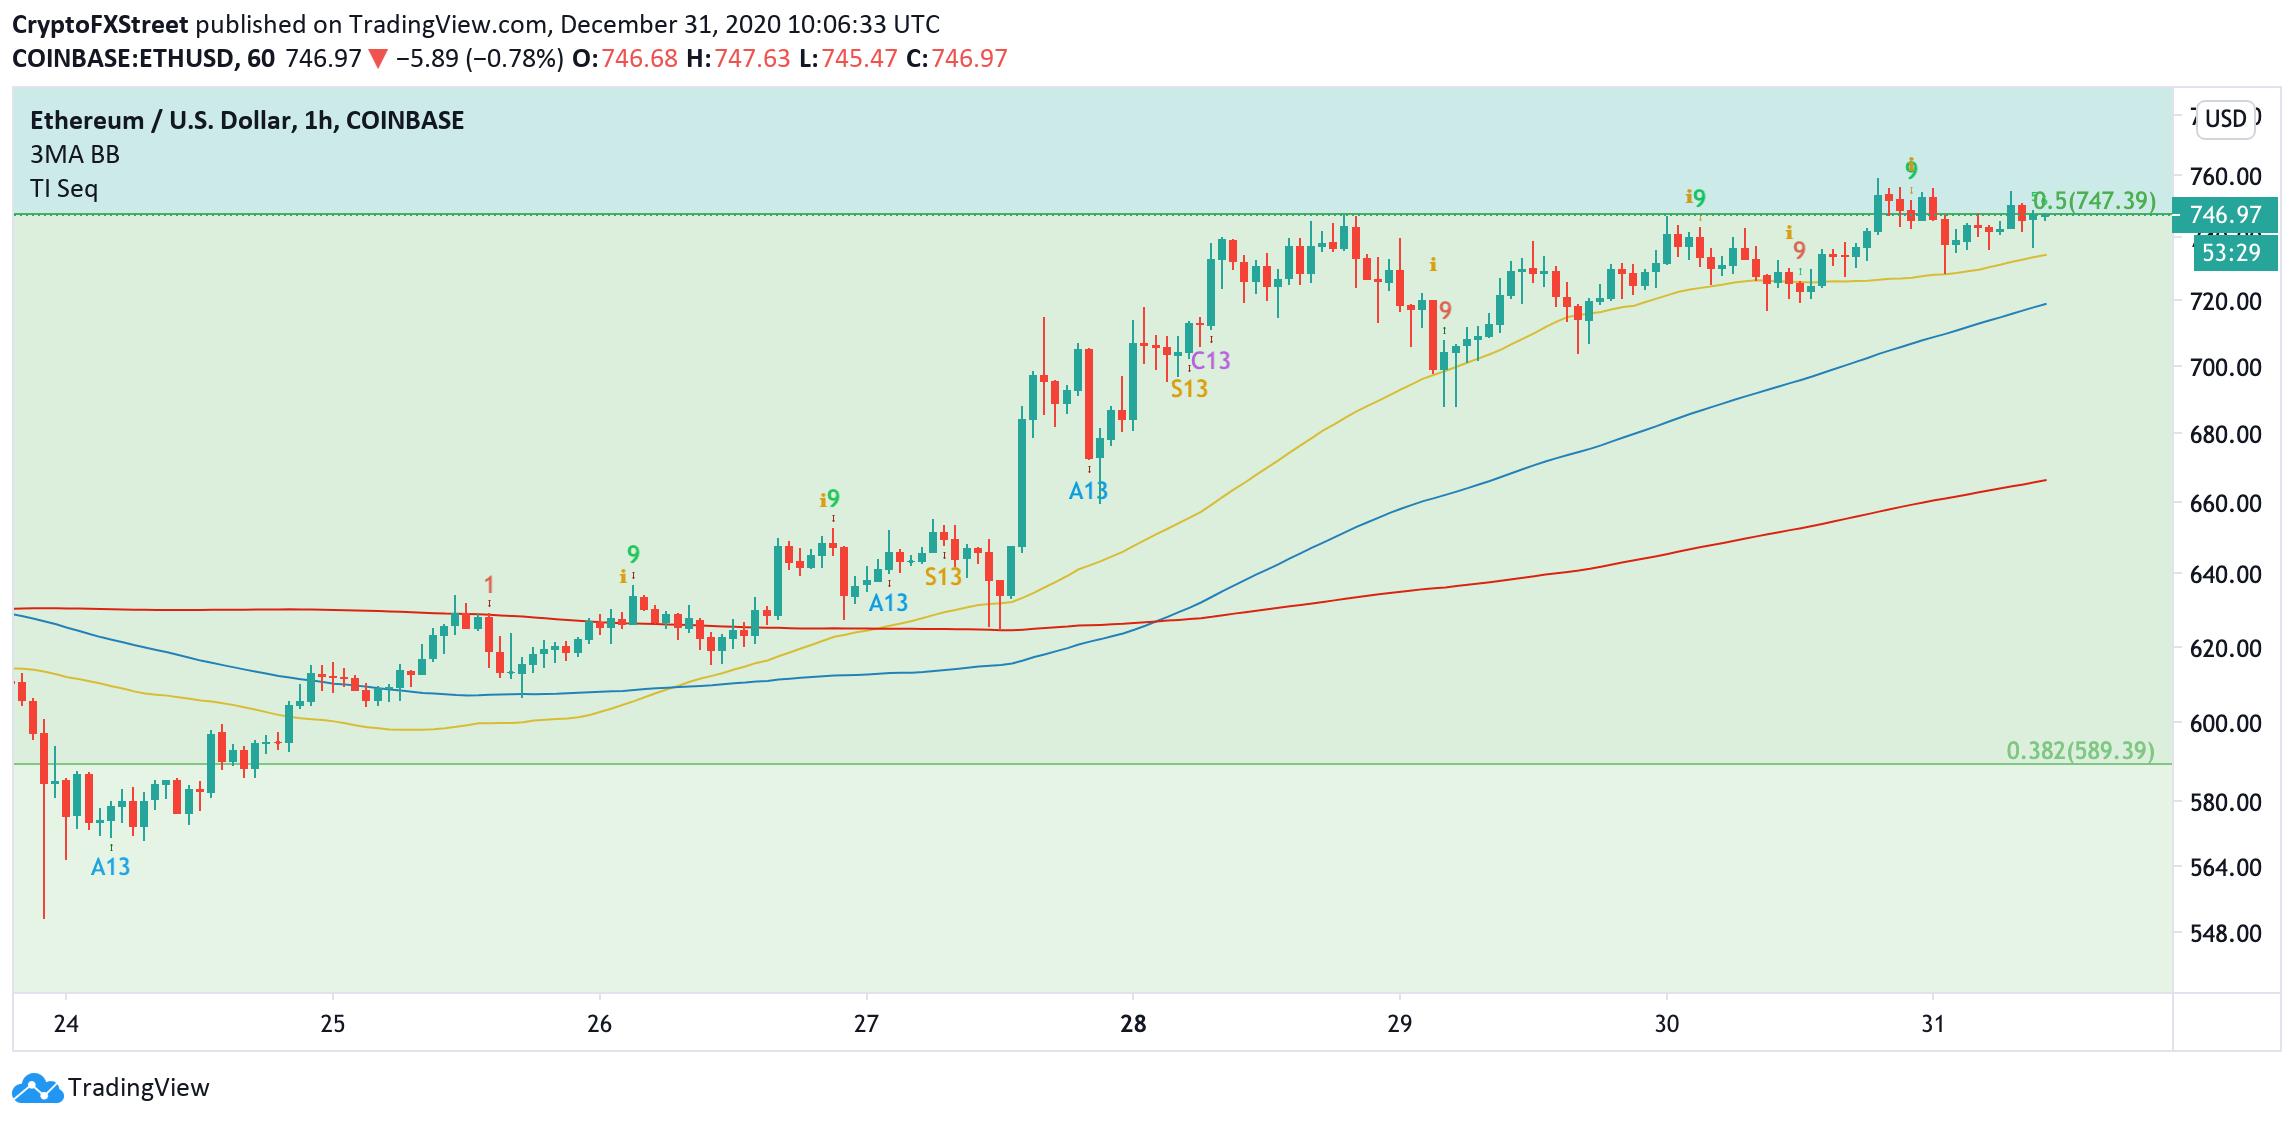 ETH, 1-hour chart